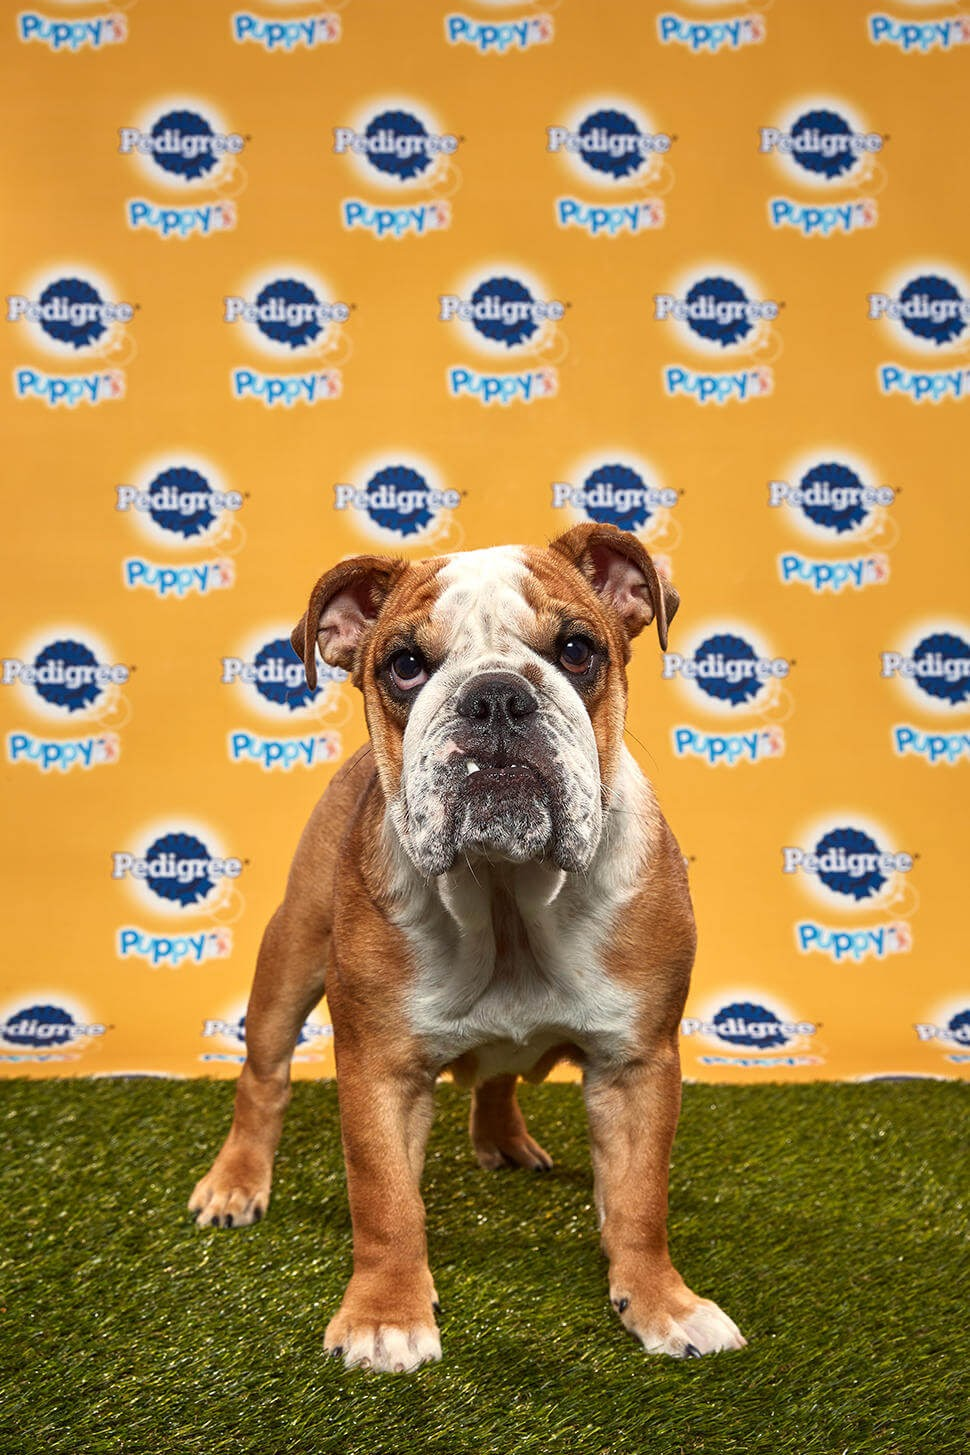 Betty dog - Animal Planet